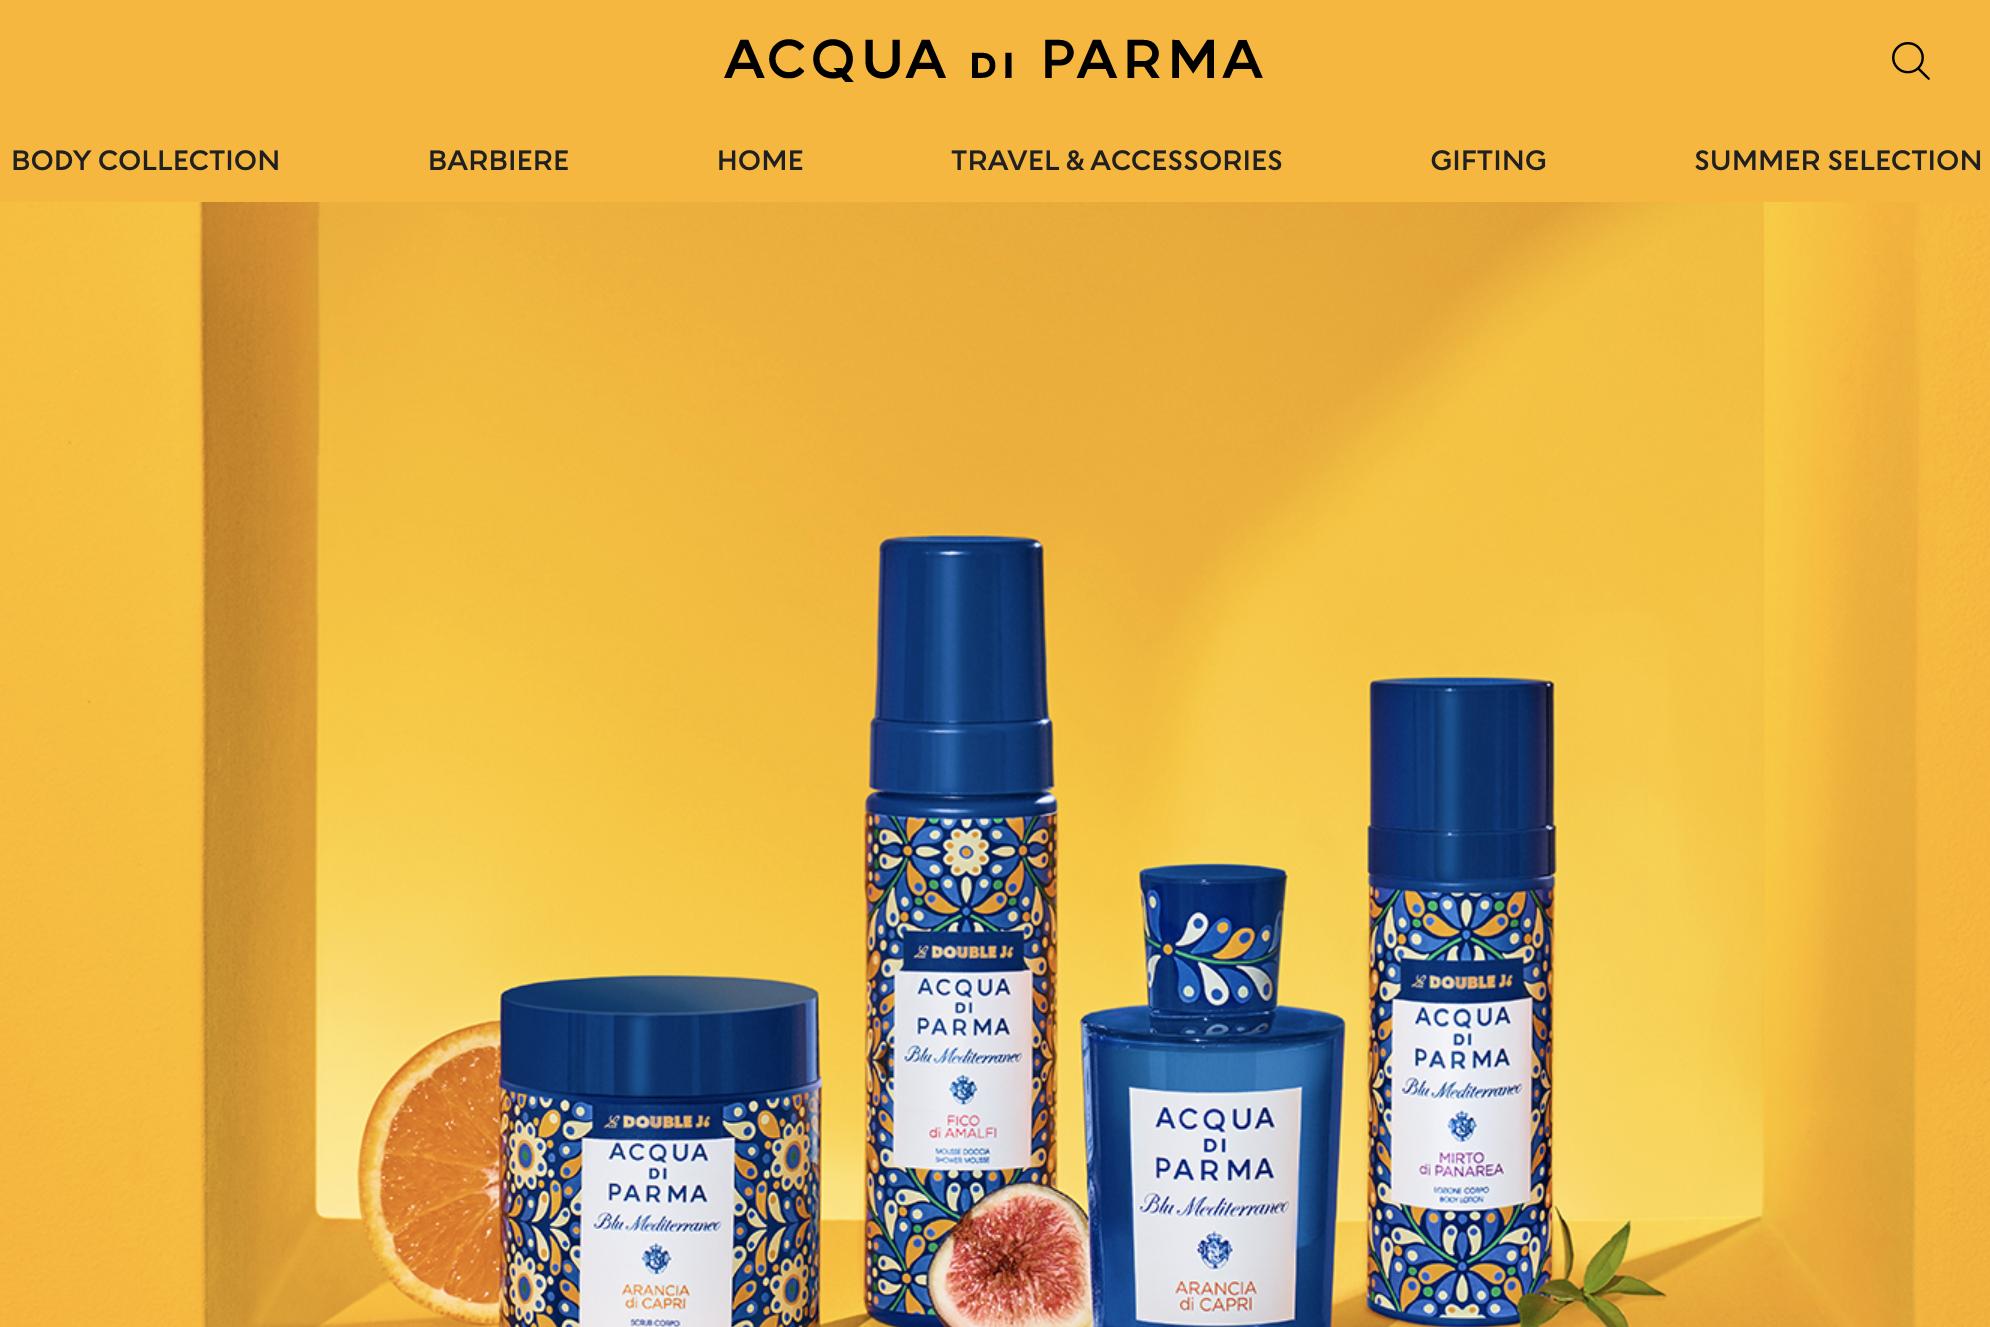 LVMH旗下百年香水品牌 Acqua di Parma 女CEO:我们必须放慢速度,但会有巨大的价值回报